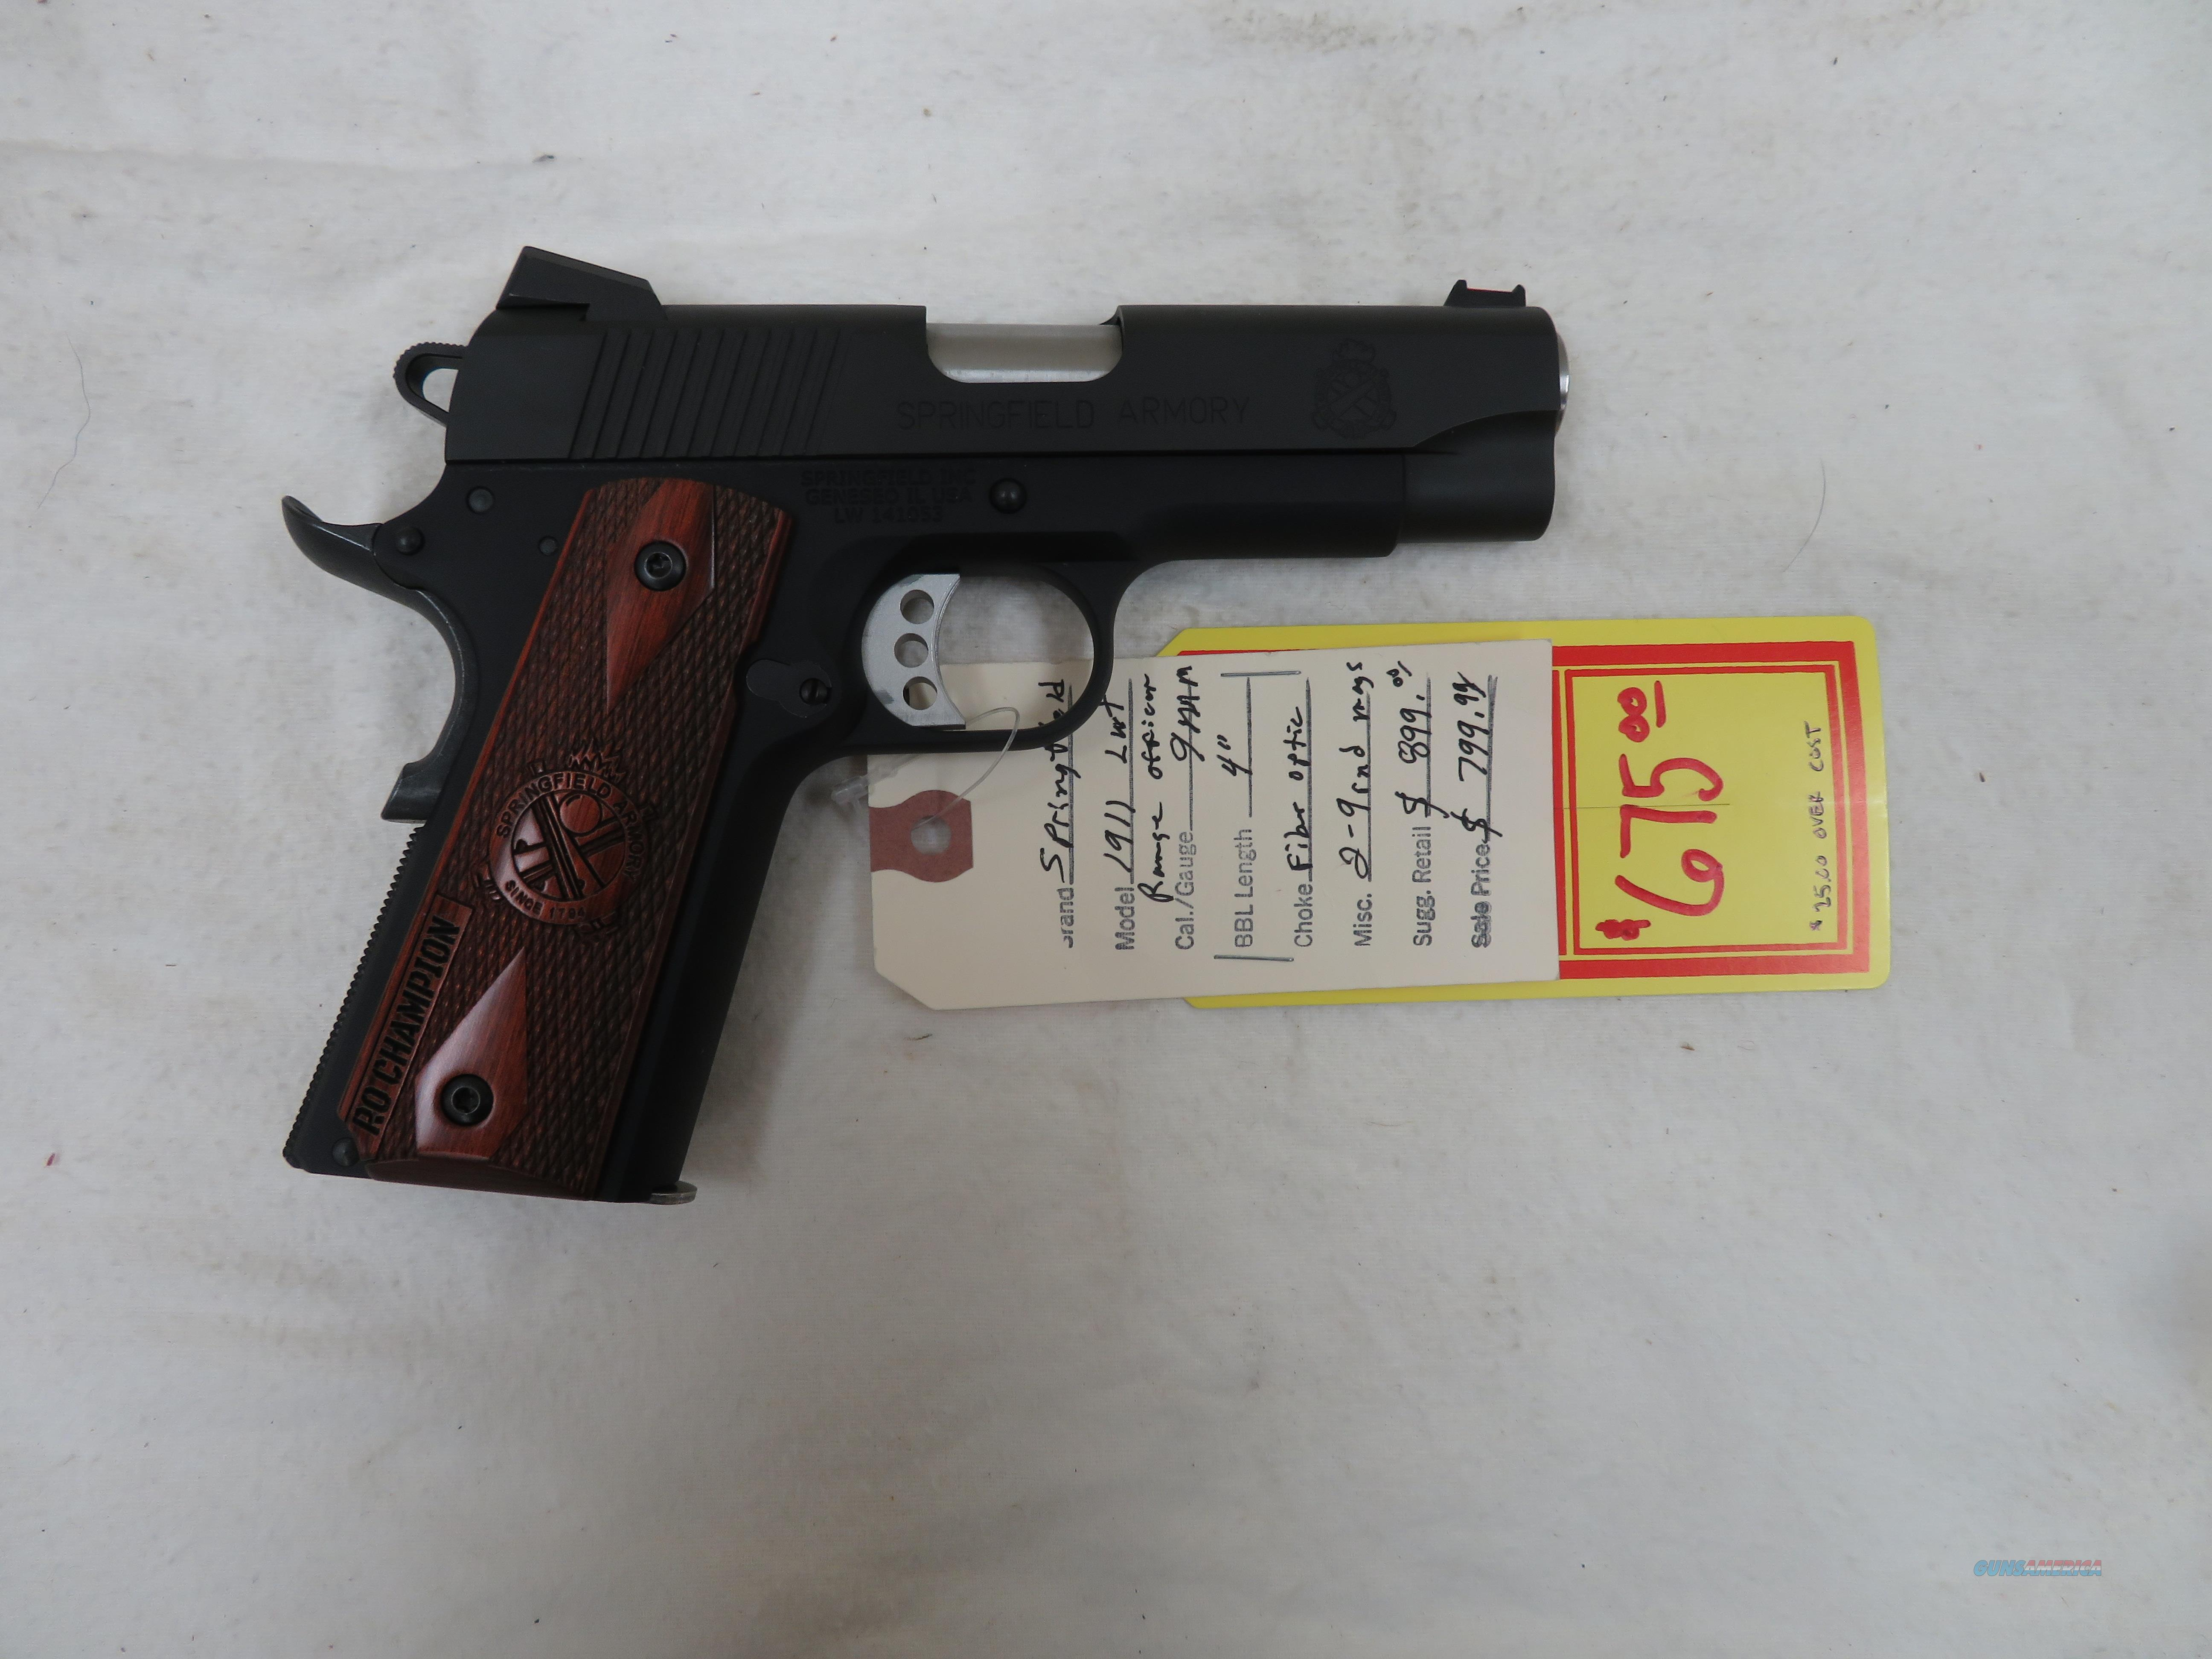 "SPRINGFIELD ARMORY 1911 LIGHTWEIGHT CHAMPION RANGE OFFICER 9MM 4""  Guns > Pistols > Springfield Armory Pistols > 1911 Type"